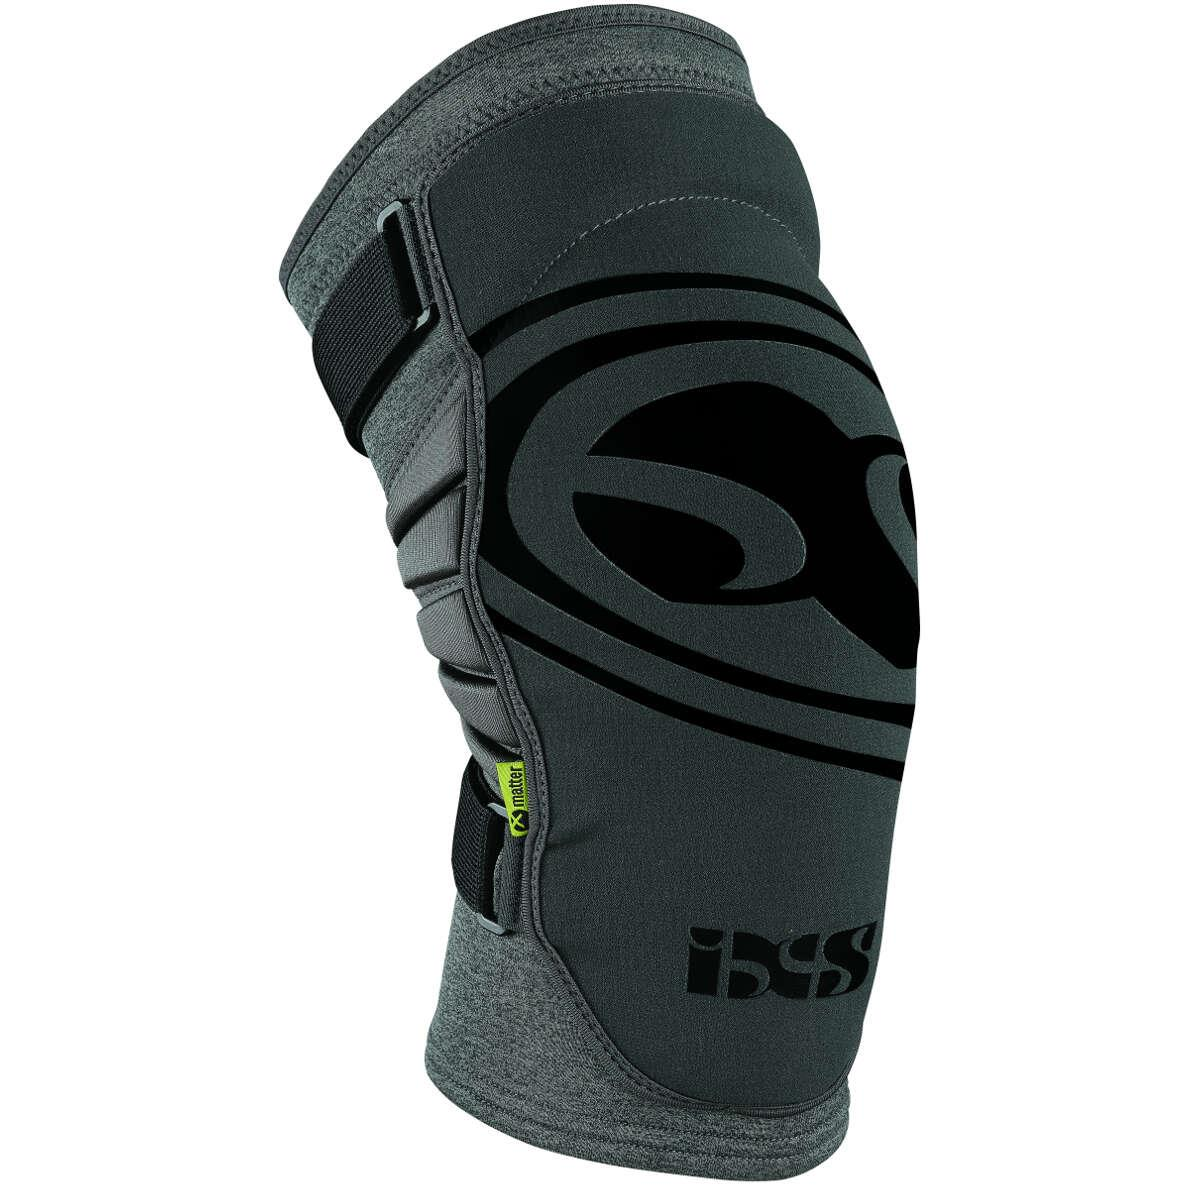 Carve Evo+ knee pads size S grey